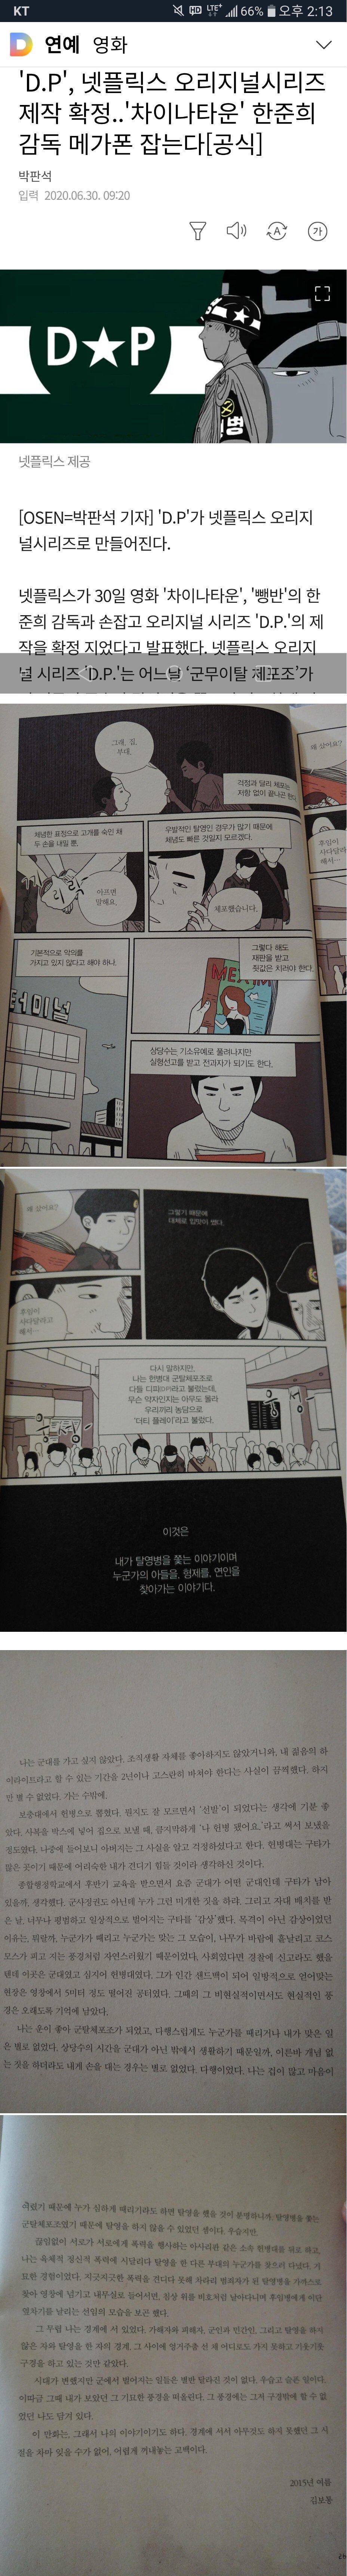 1 (2).jpg 넷플릭스로 드라마화되는 한국군대 얘기